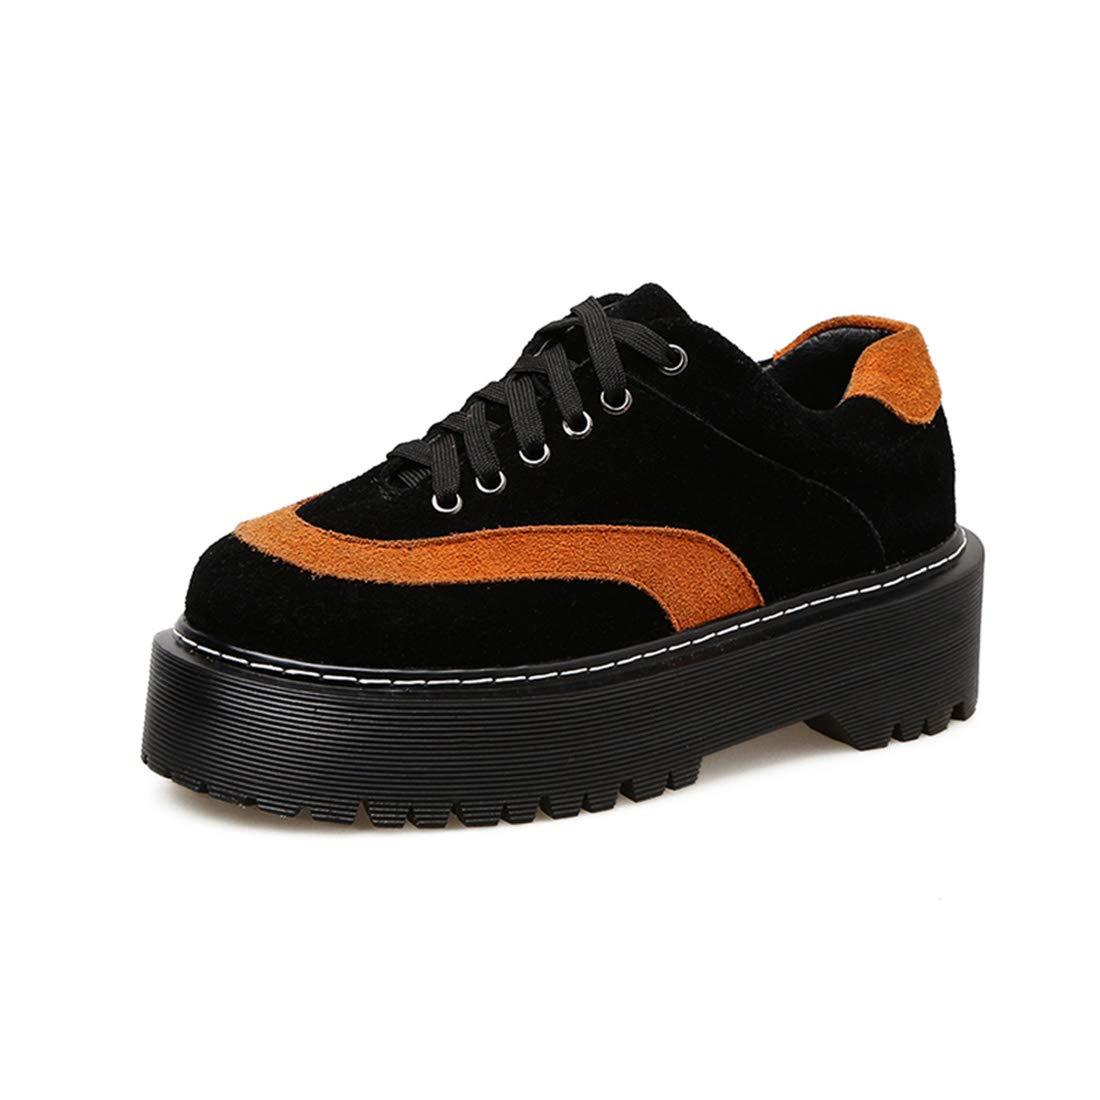 DANDANJIE Damenschuhe Wildleder Fallen Comfort Oxfords Oxfords Comfort Keile Ferse Runde Zehenspitzen Schuhe d868b4